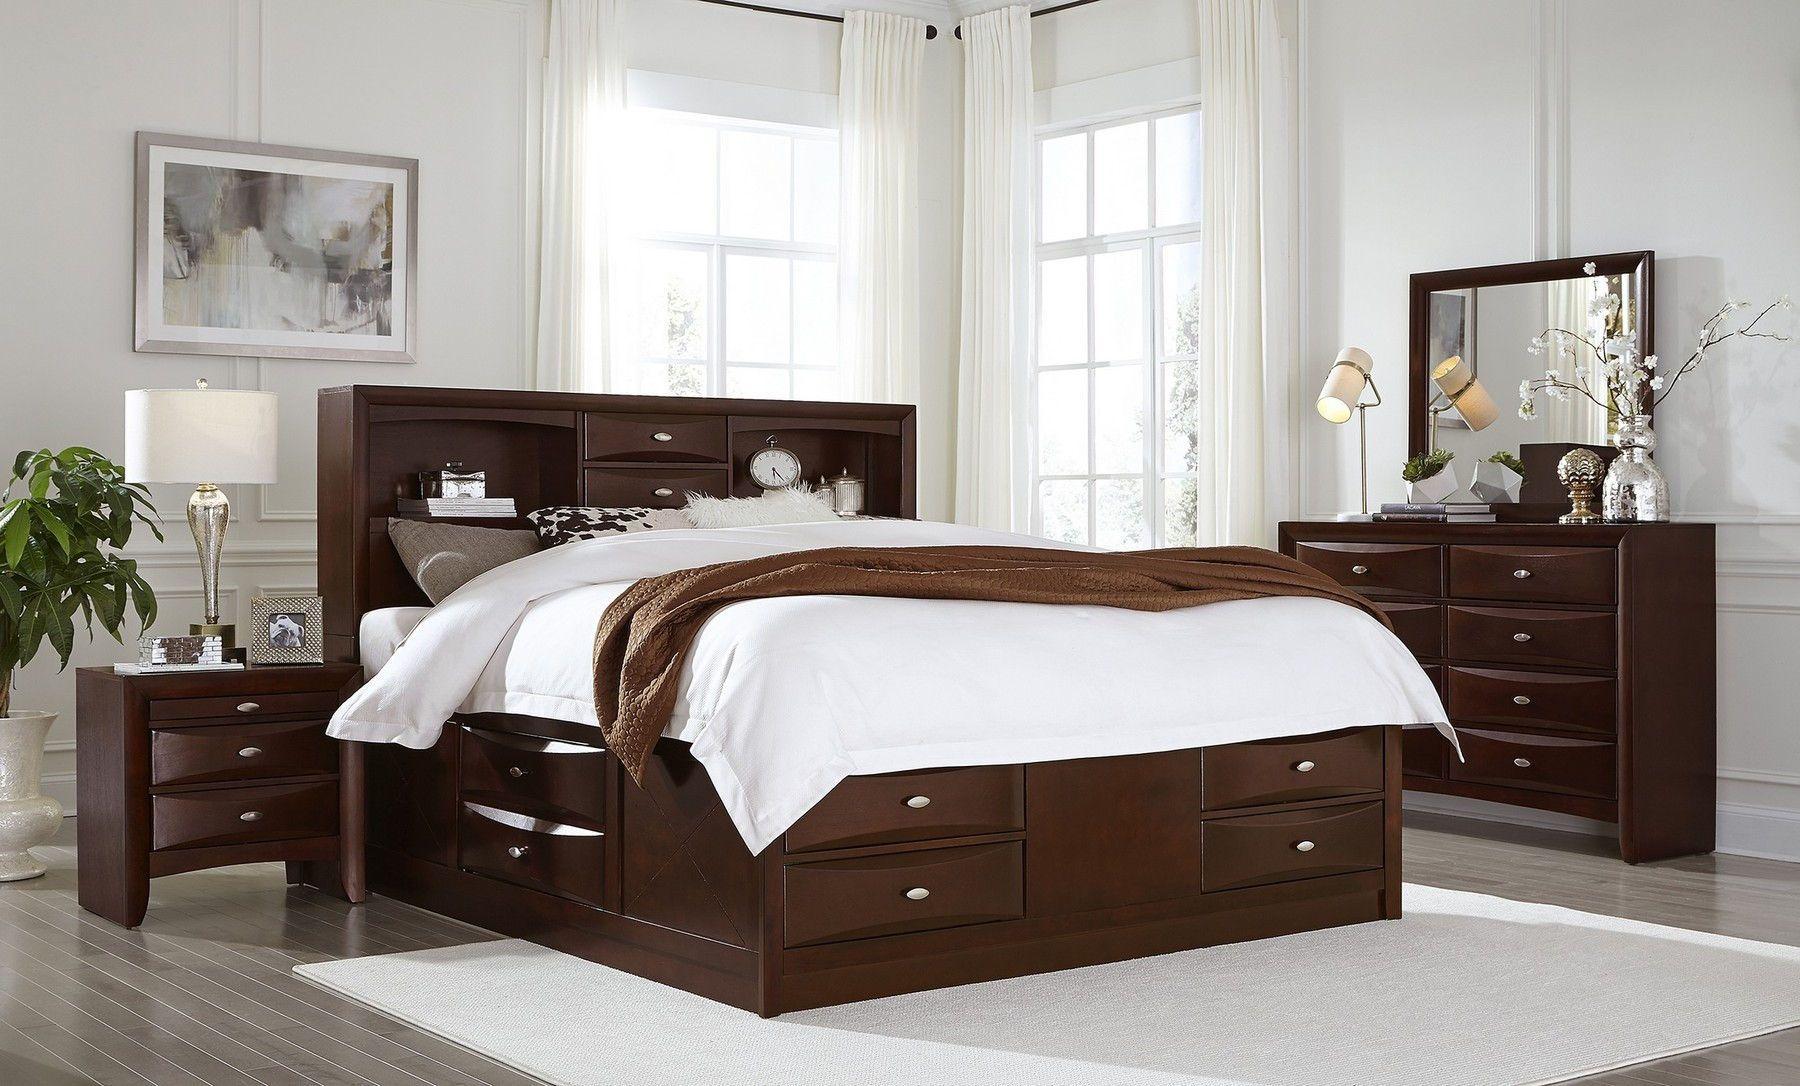 Global Usa Linda Queen Set Merlot Modern Wood 5pcs Bedroom Set